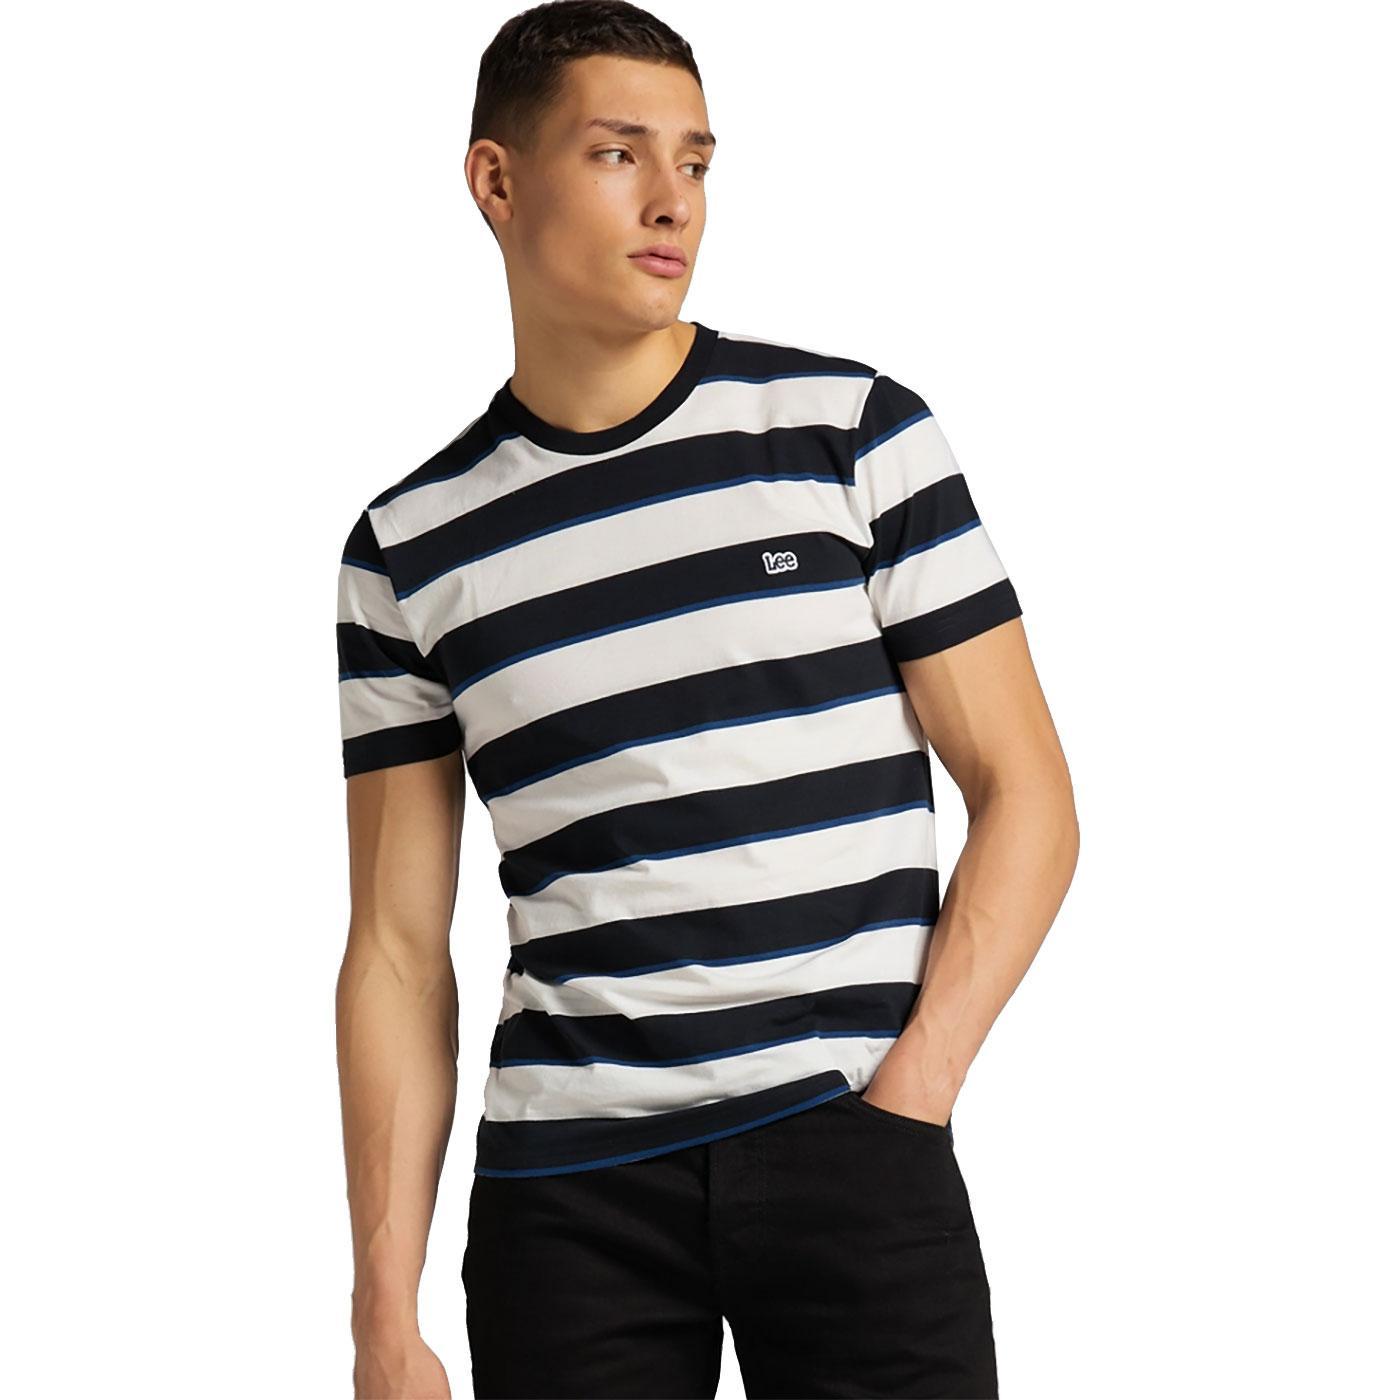 LEE JEANS Retro Mod Multi Stripe T-Shirt BLACK